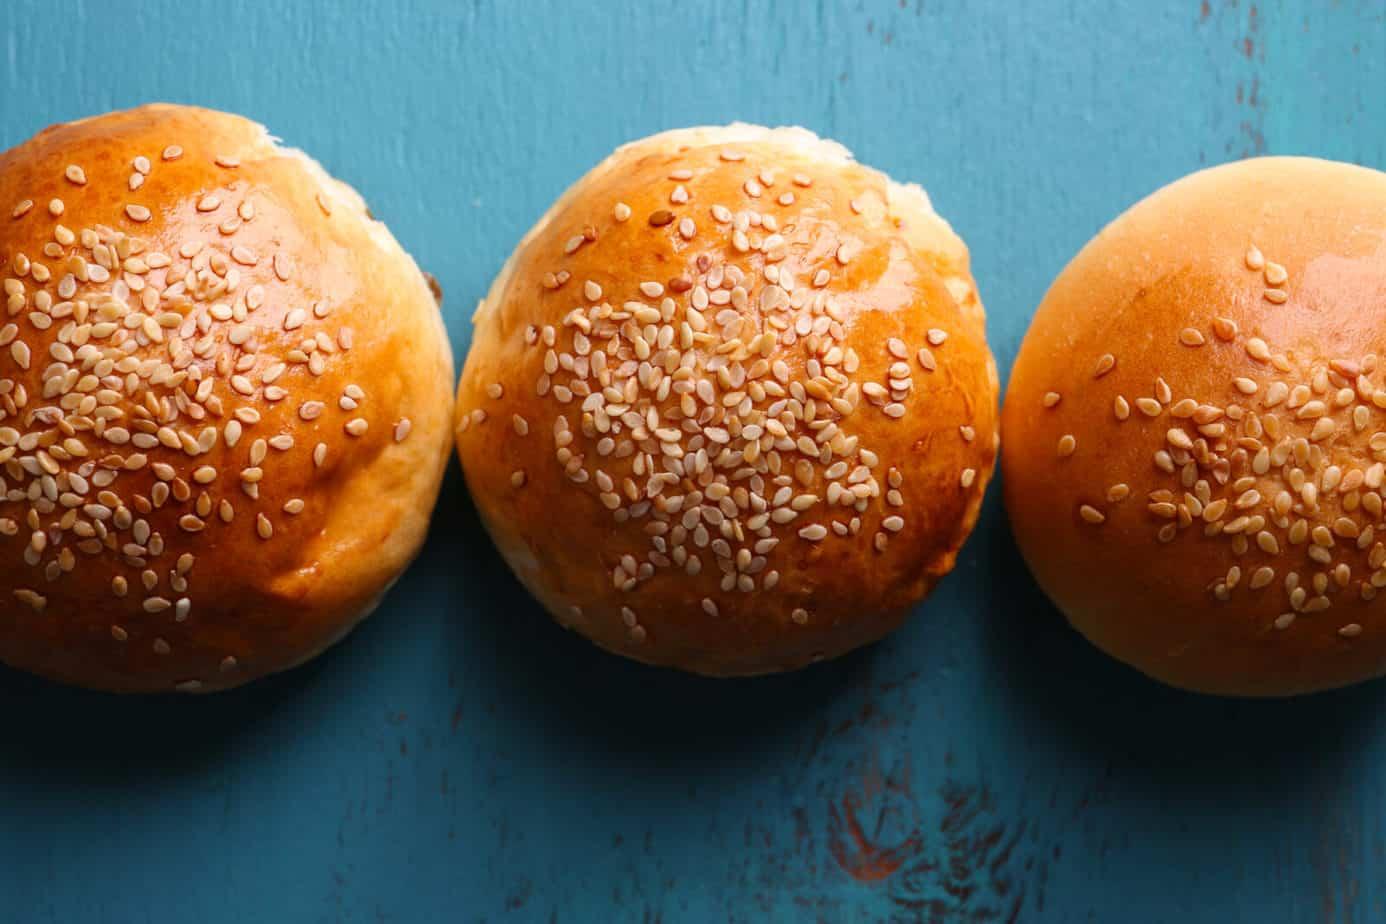 Are hamburger buns vegan?